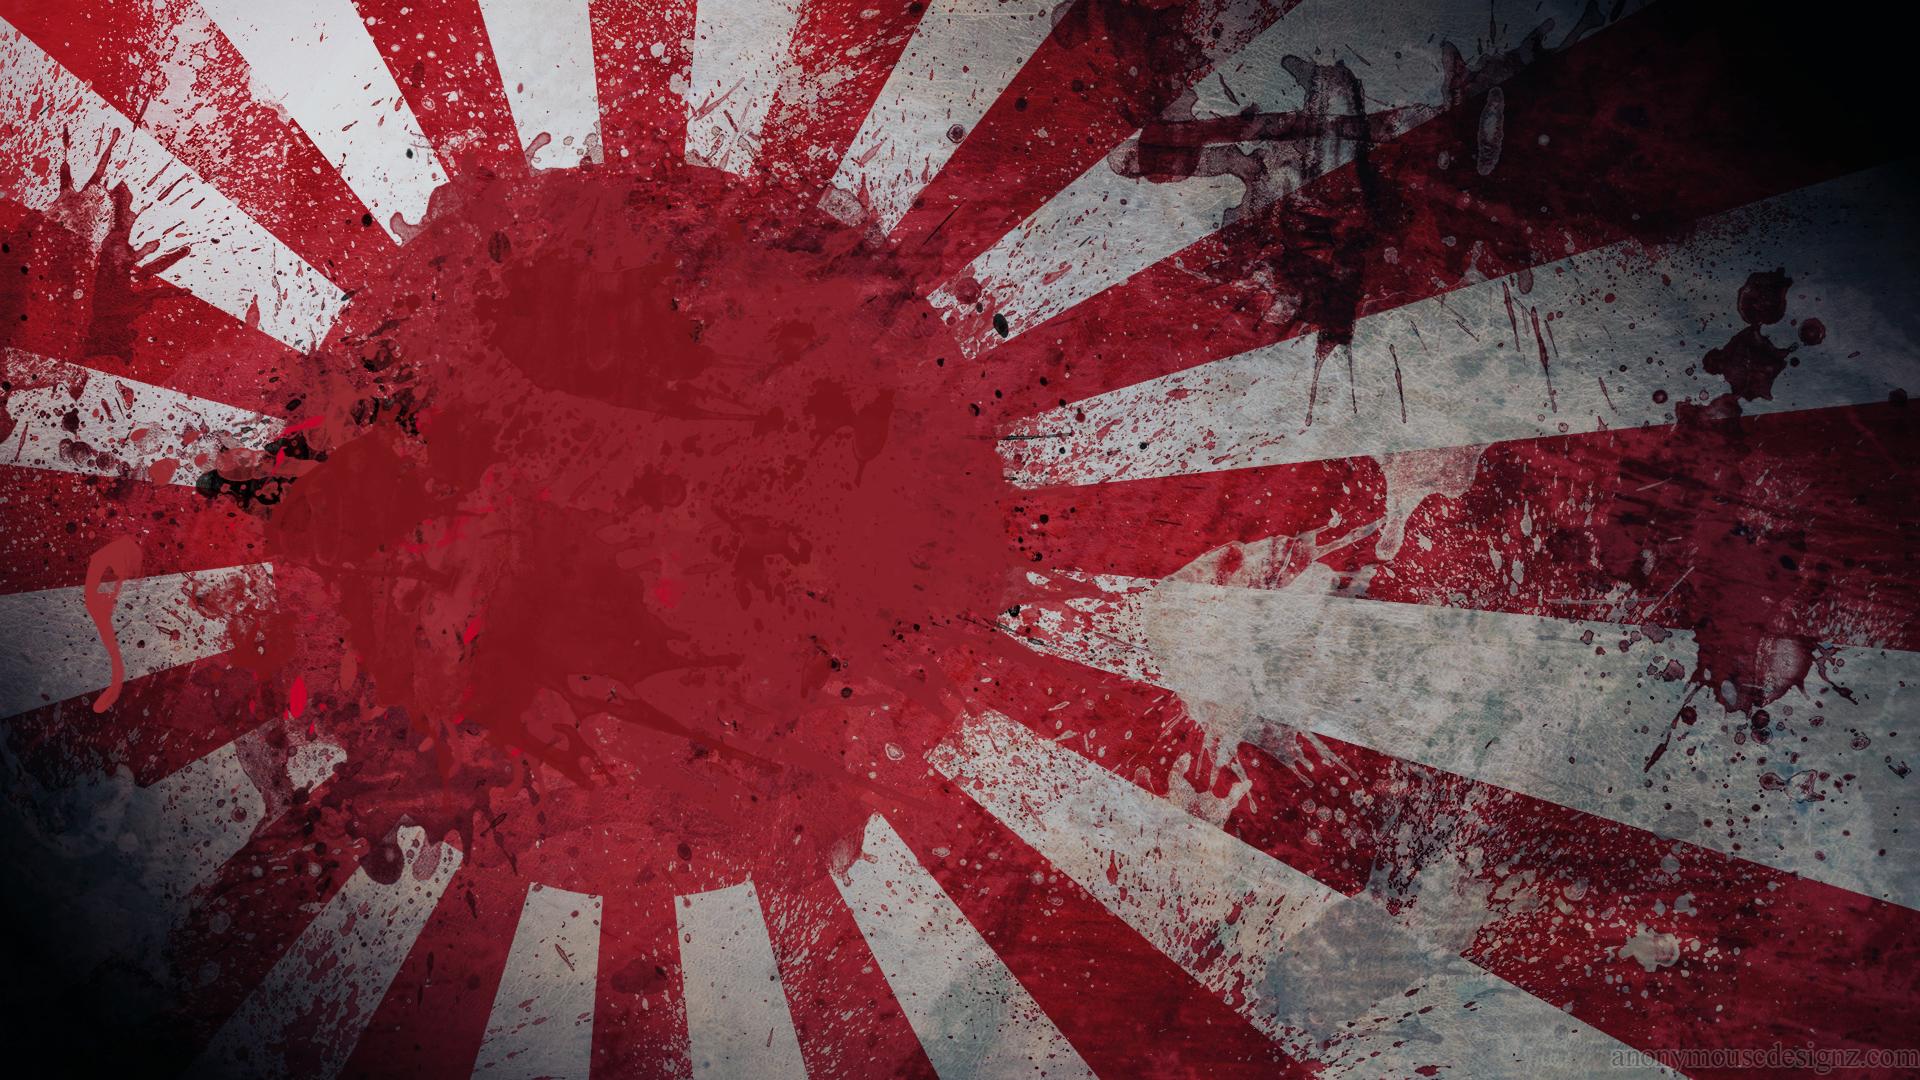 Hd wallpaper japan - Japan Japanese Wallpaper 1920x1080 Japan Japanese Flags